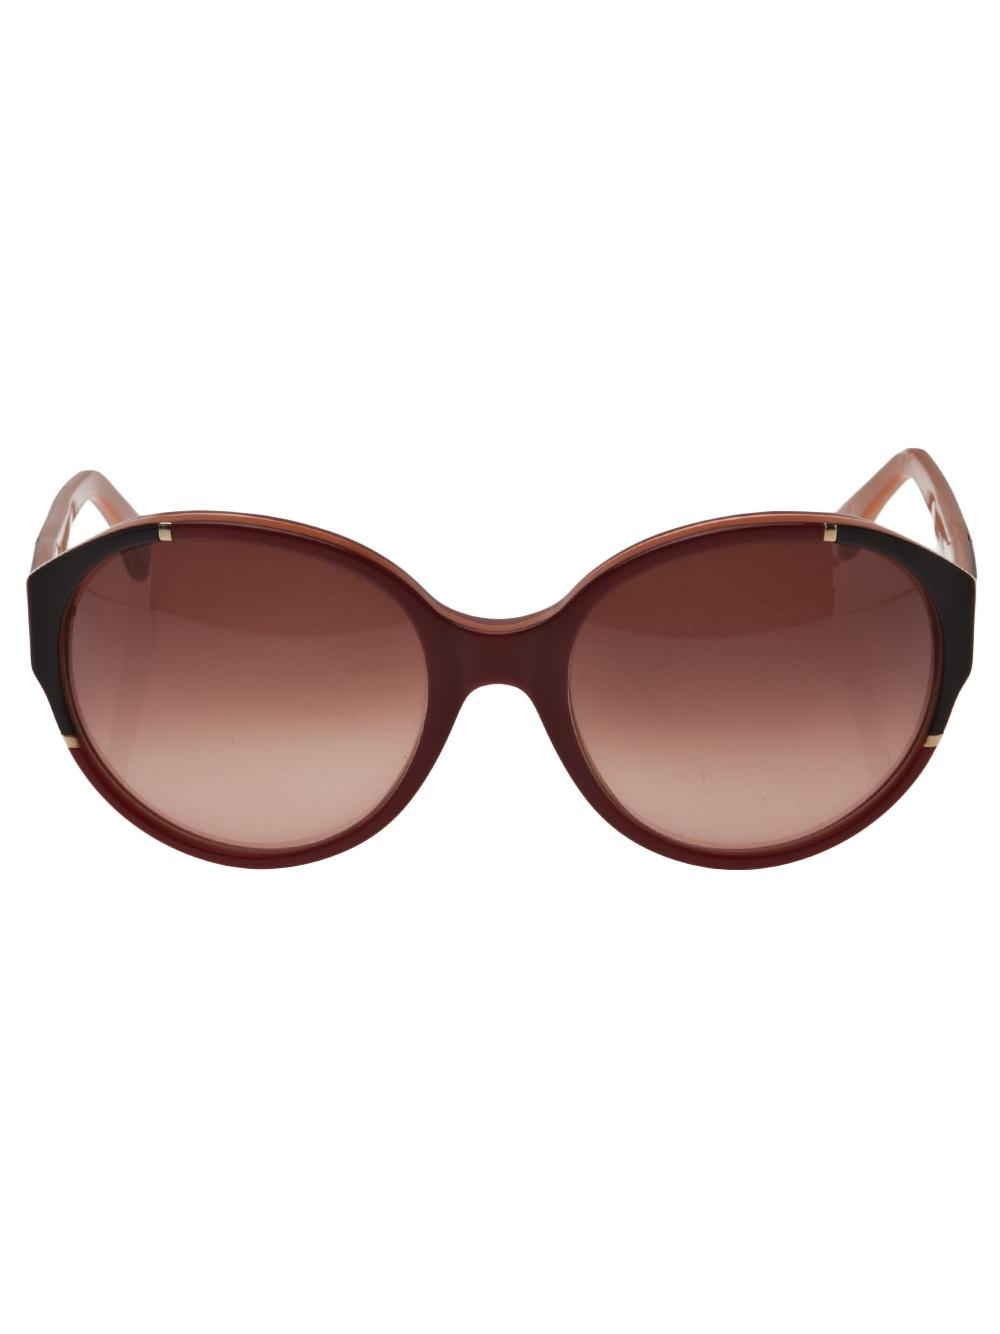 Marni Oversized Round Sunglasses in Red